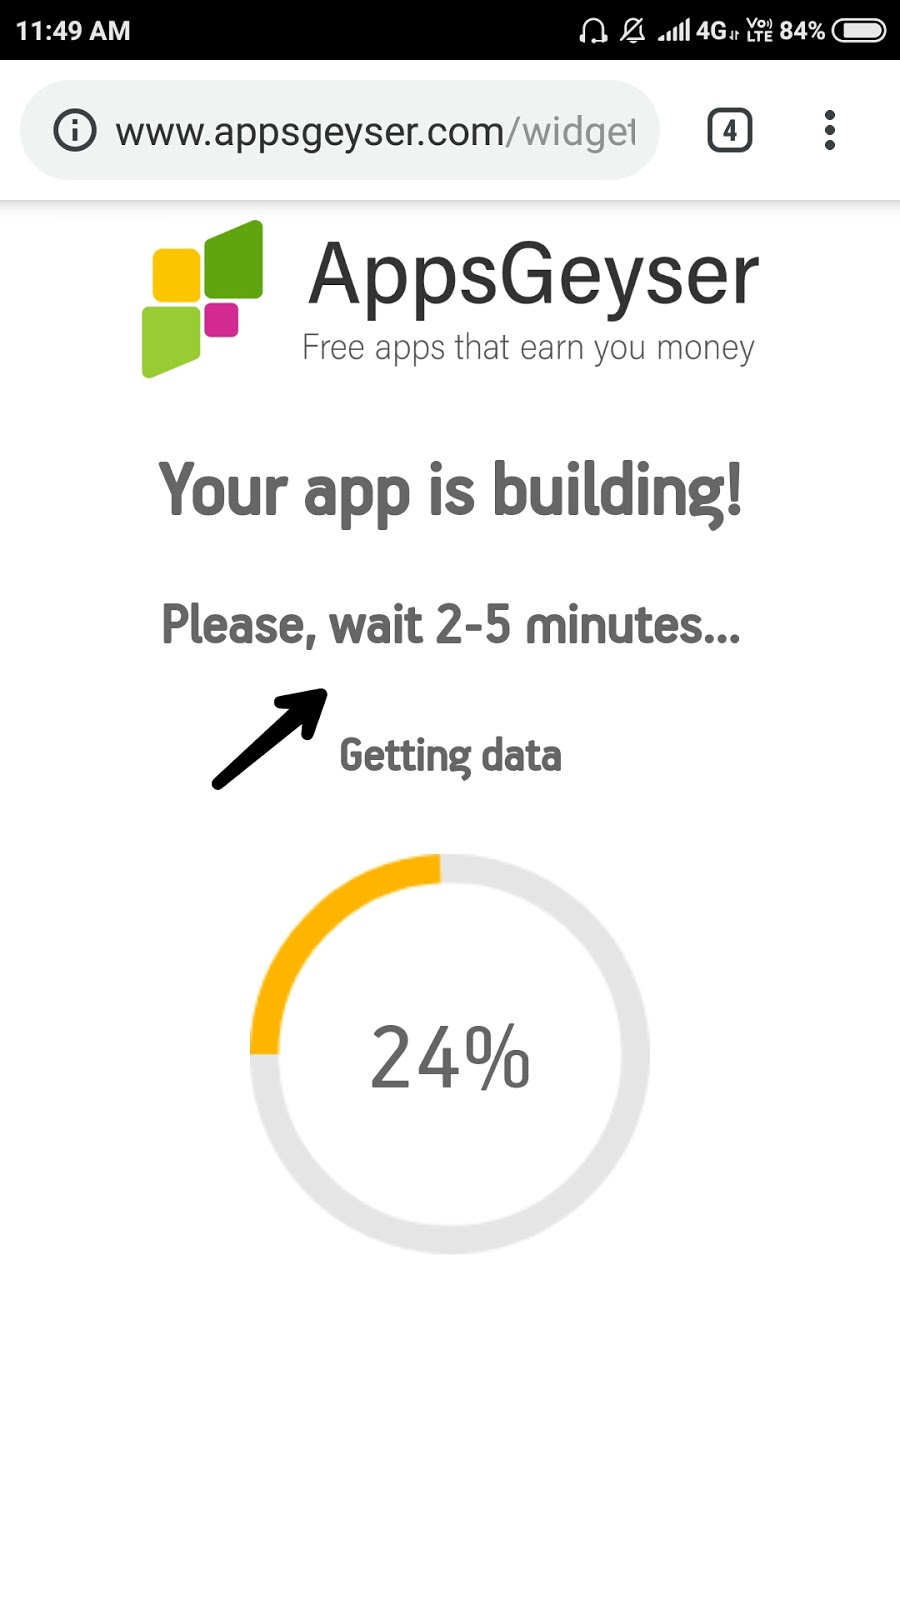 Appsgeyser pe free account aur android app kaise banaye?